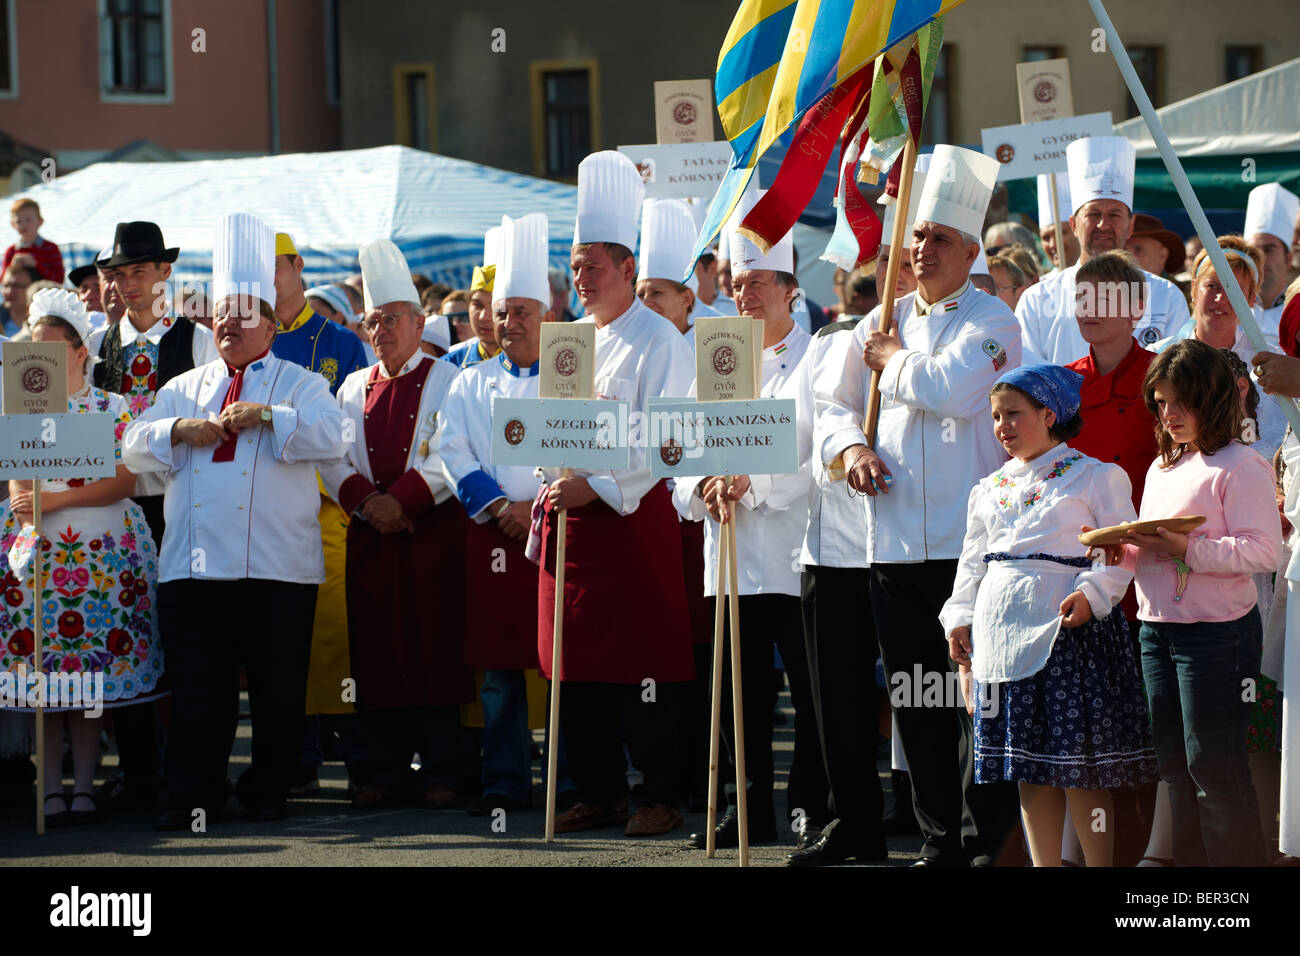 Competators at the Hungarian Regional Gastronomic Festival 2009 - Gyor ( Győr ) Hungary - Stock Image